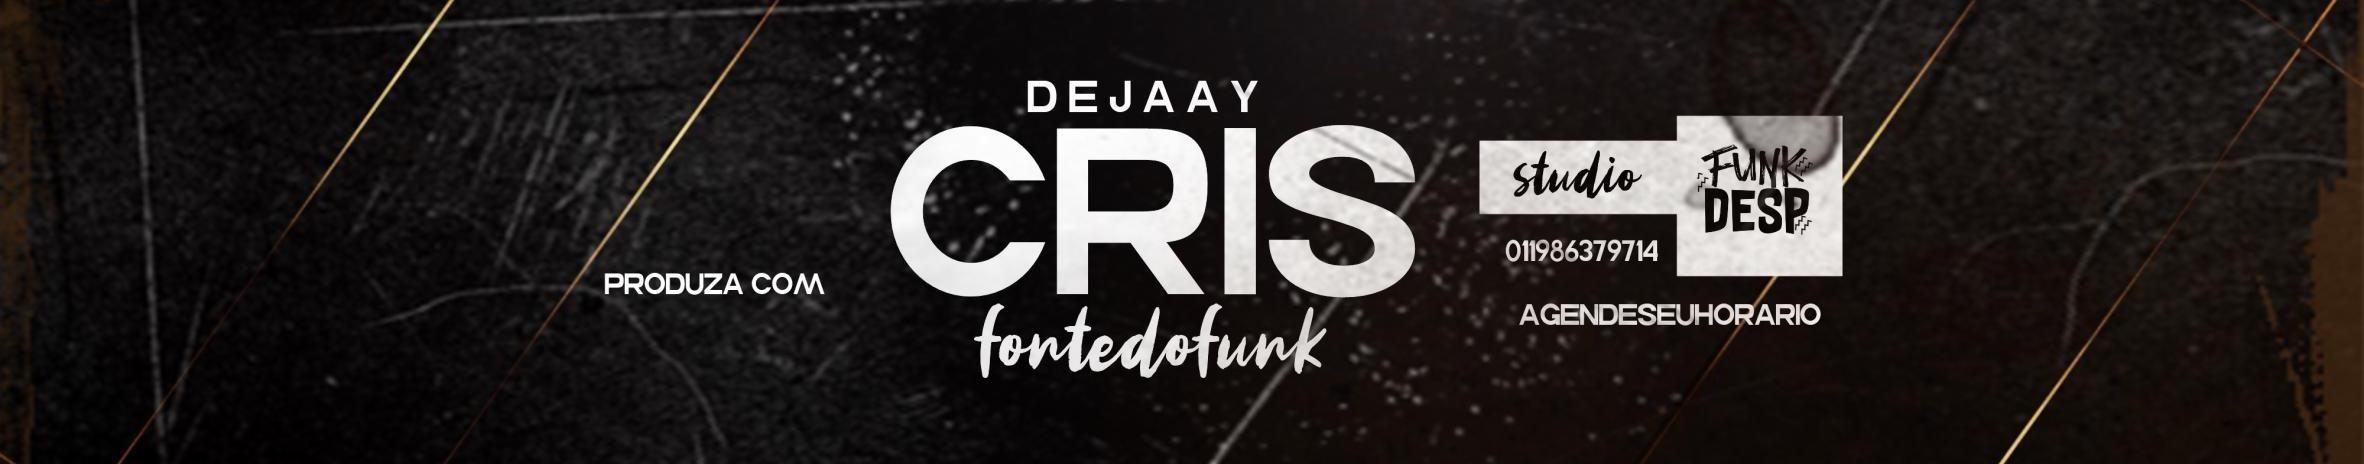 Imagem de capa de DJ Cris Fontedofunk